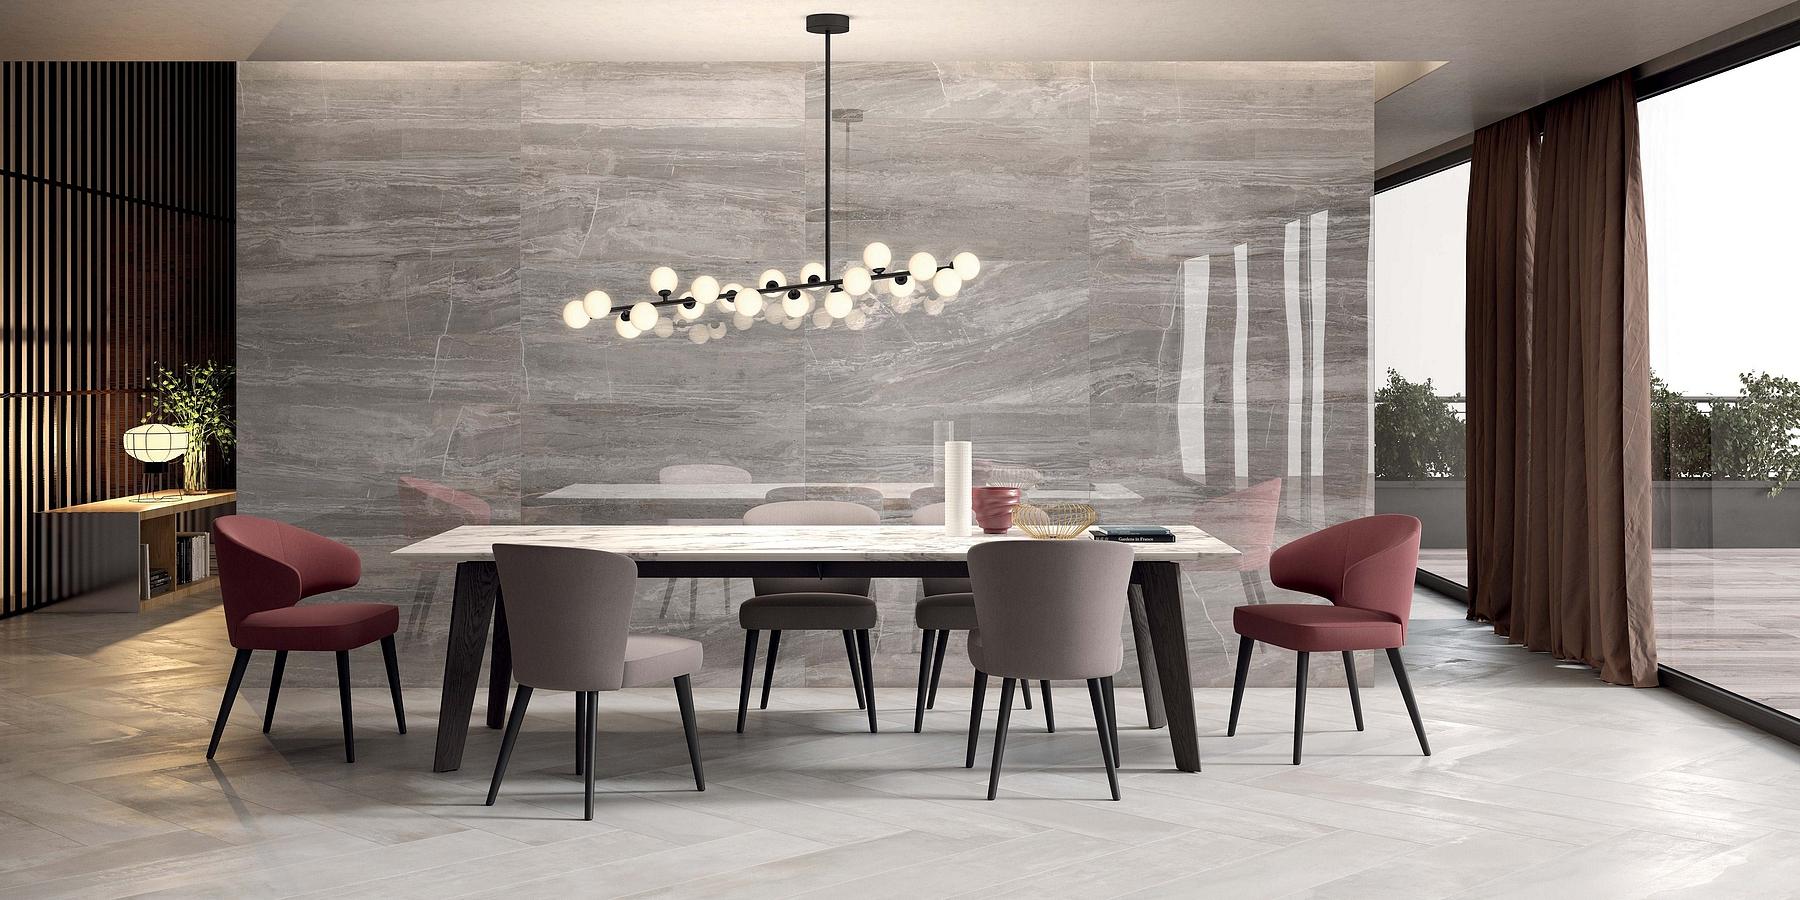 Piastrelle in gres porcellanato sensi di abk tile expert for Abk interno 09